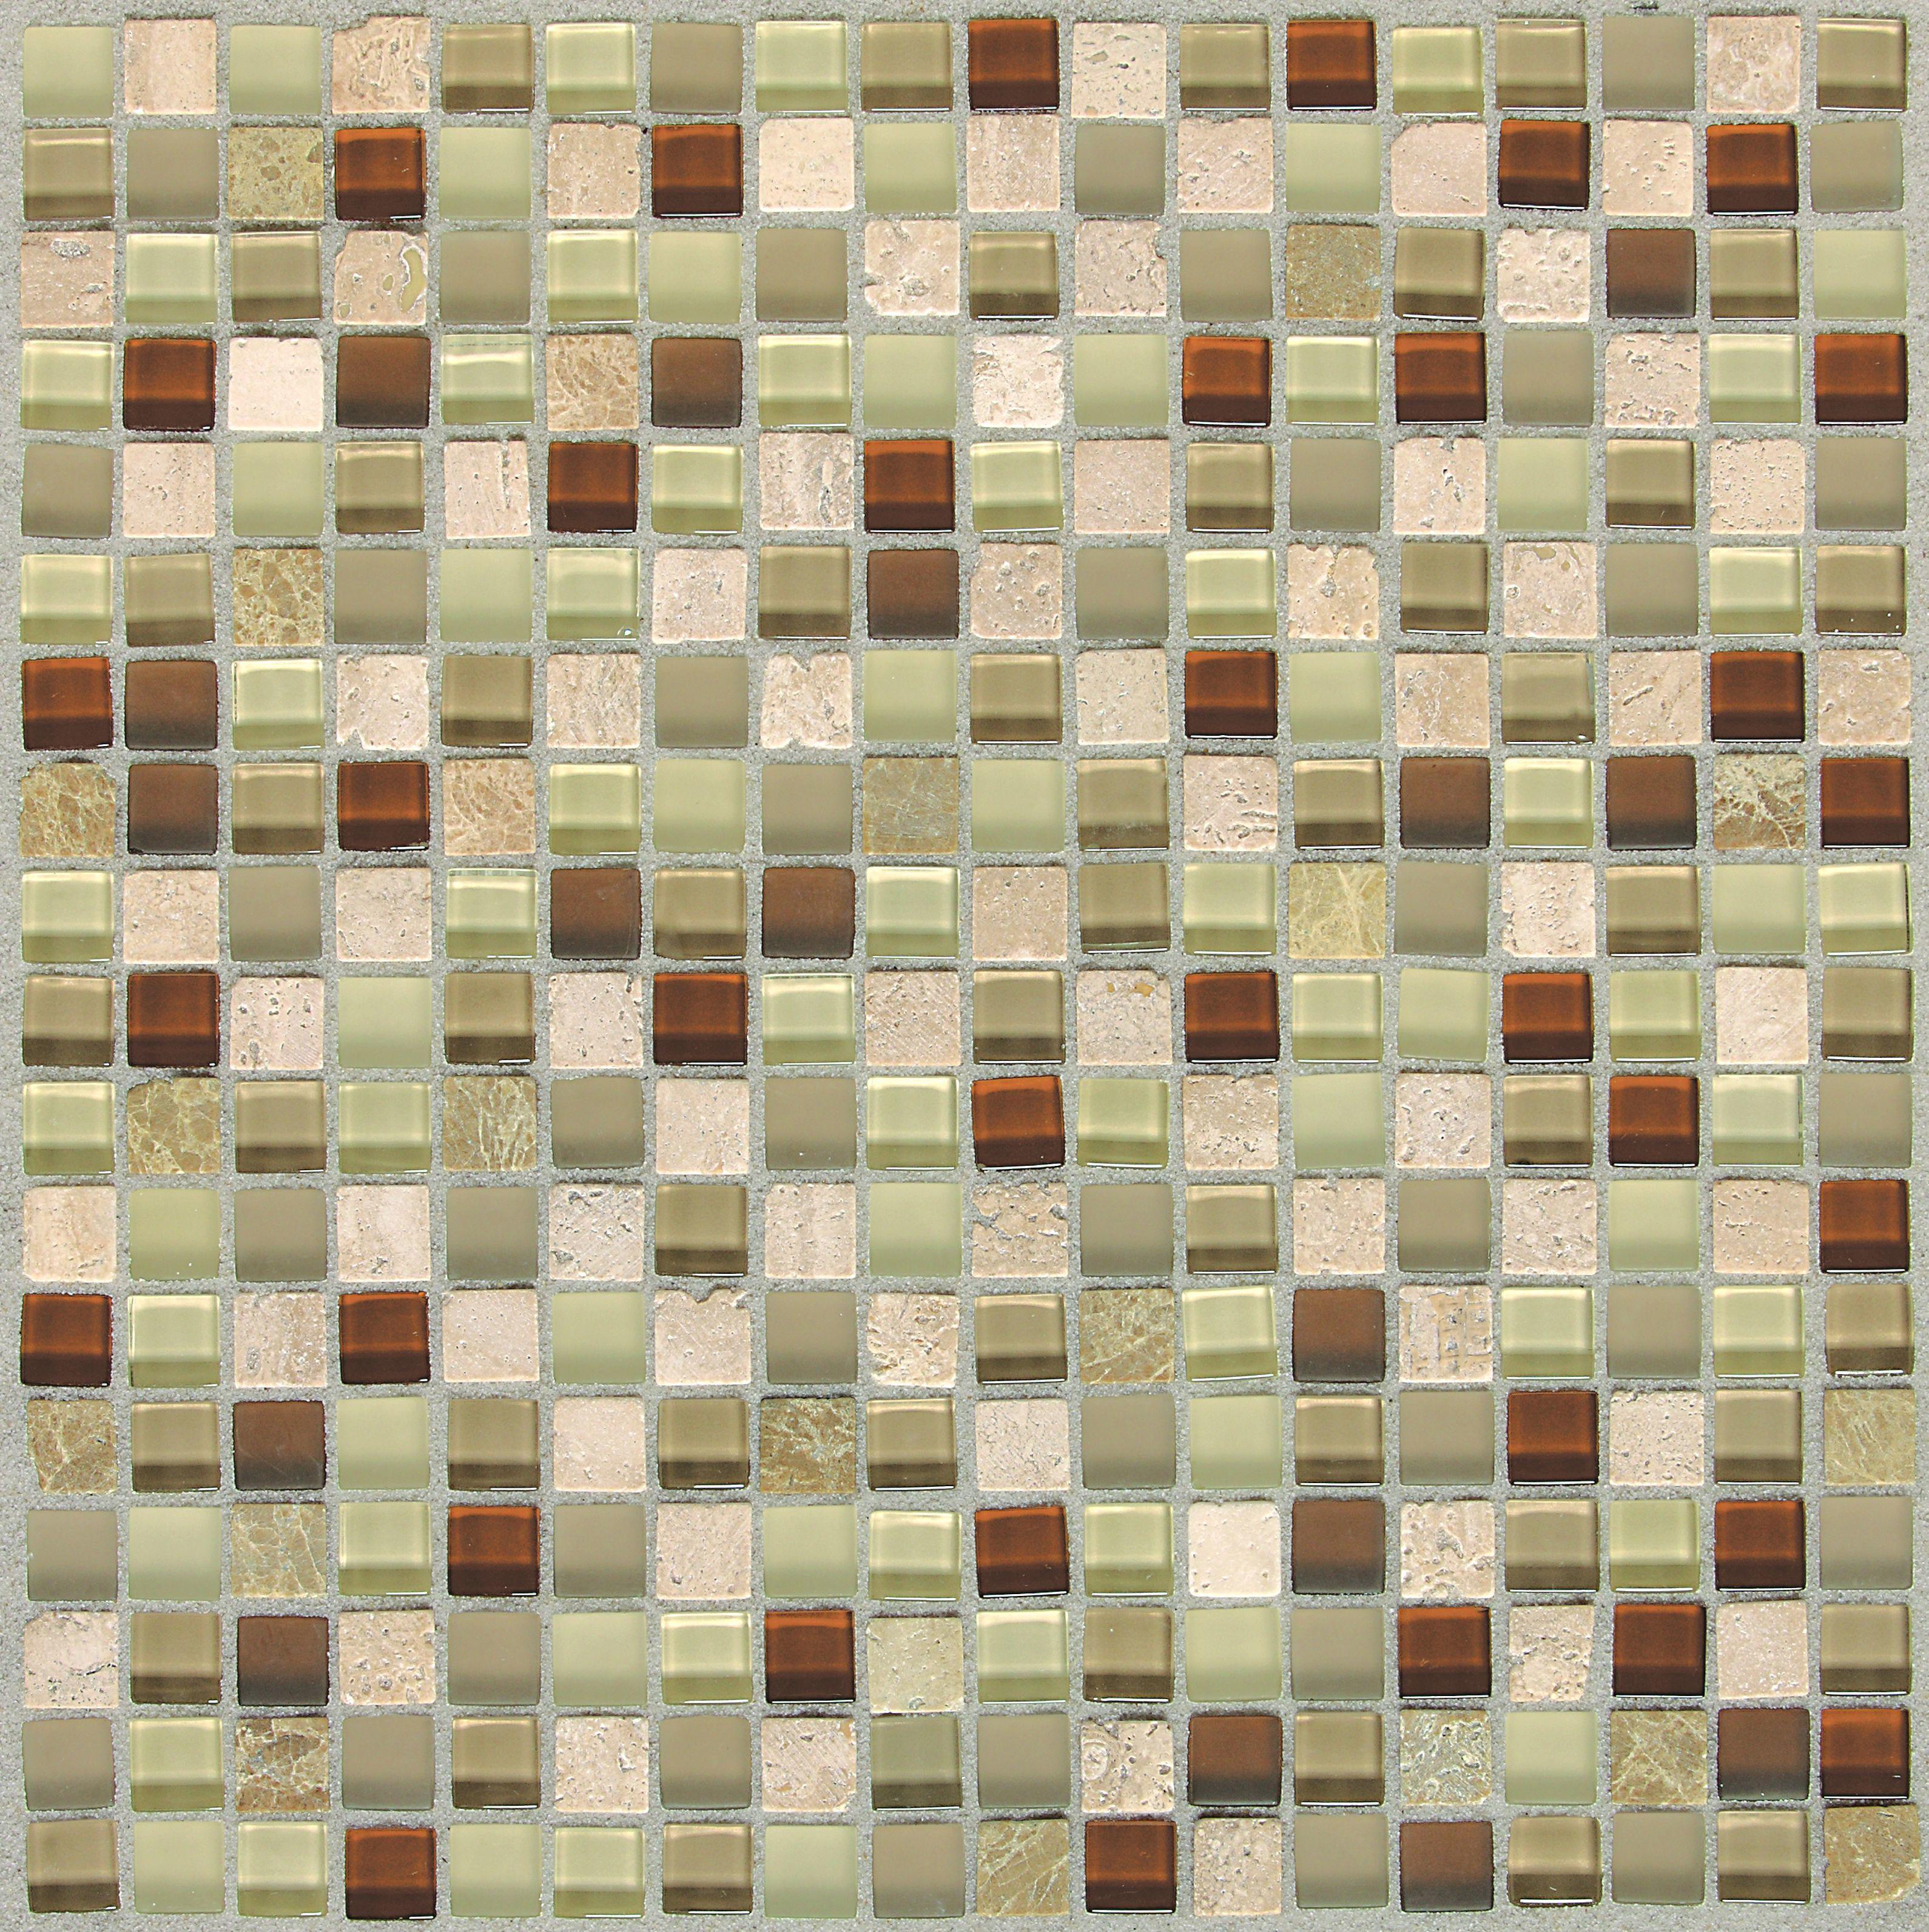 Mohawk industries 15278 caramel splash caramel splash ceramic mohawk industries 15278 caramel splash caramel splash ceramic multi surface tile 12 inch x 12 inch sold by sheet floormall doublecrazyfo Image collections